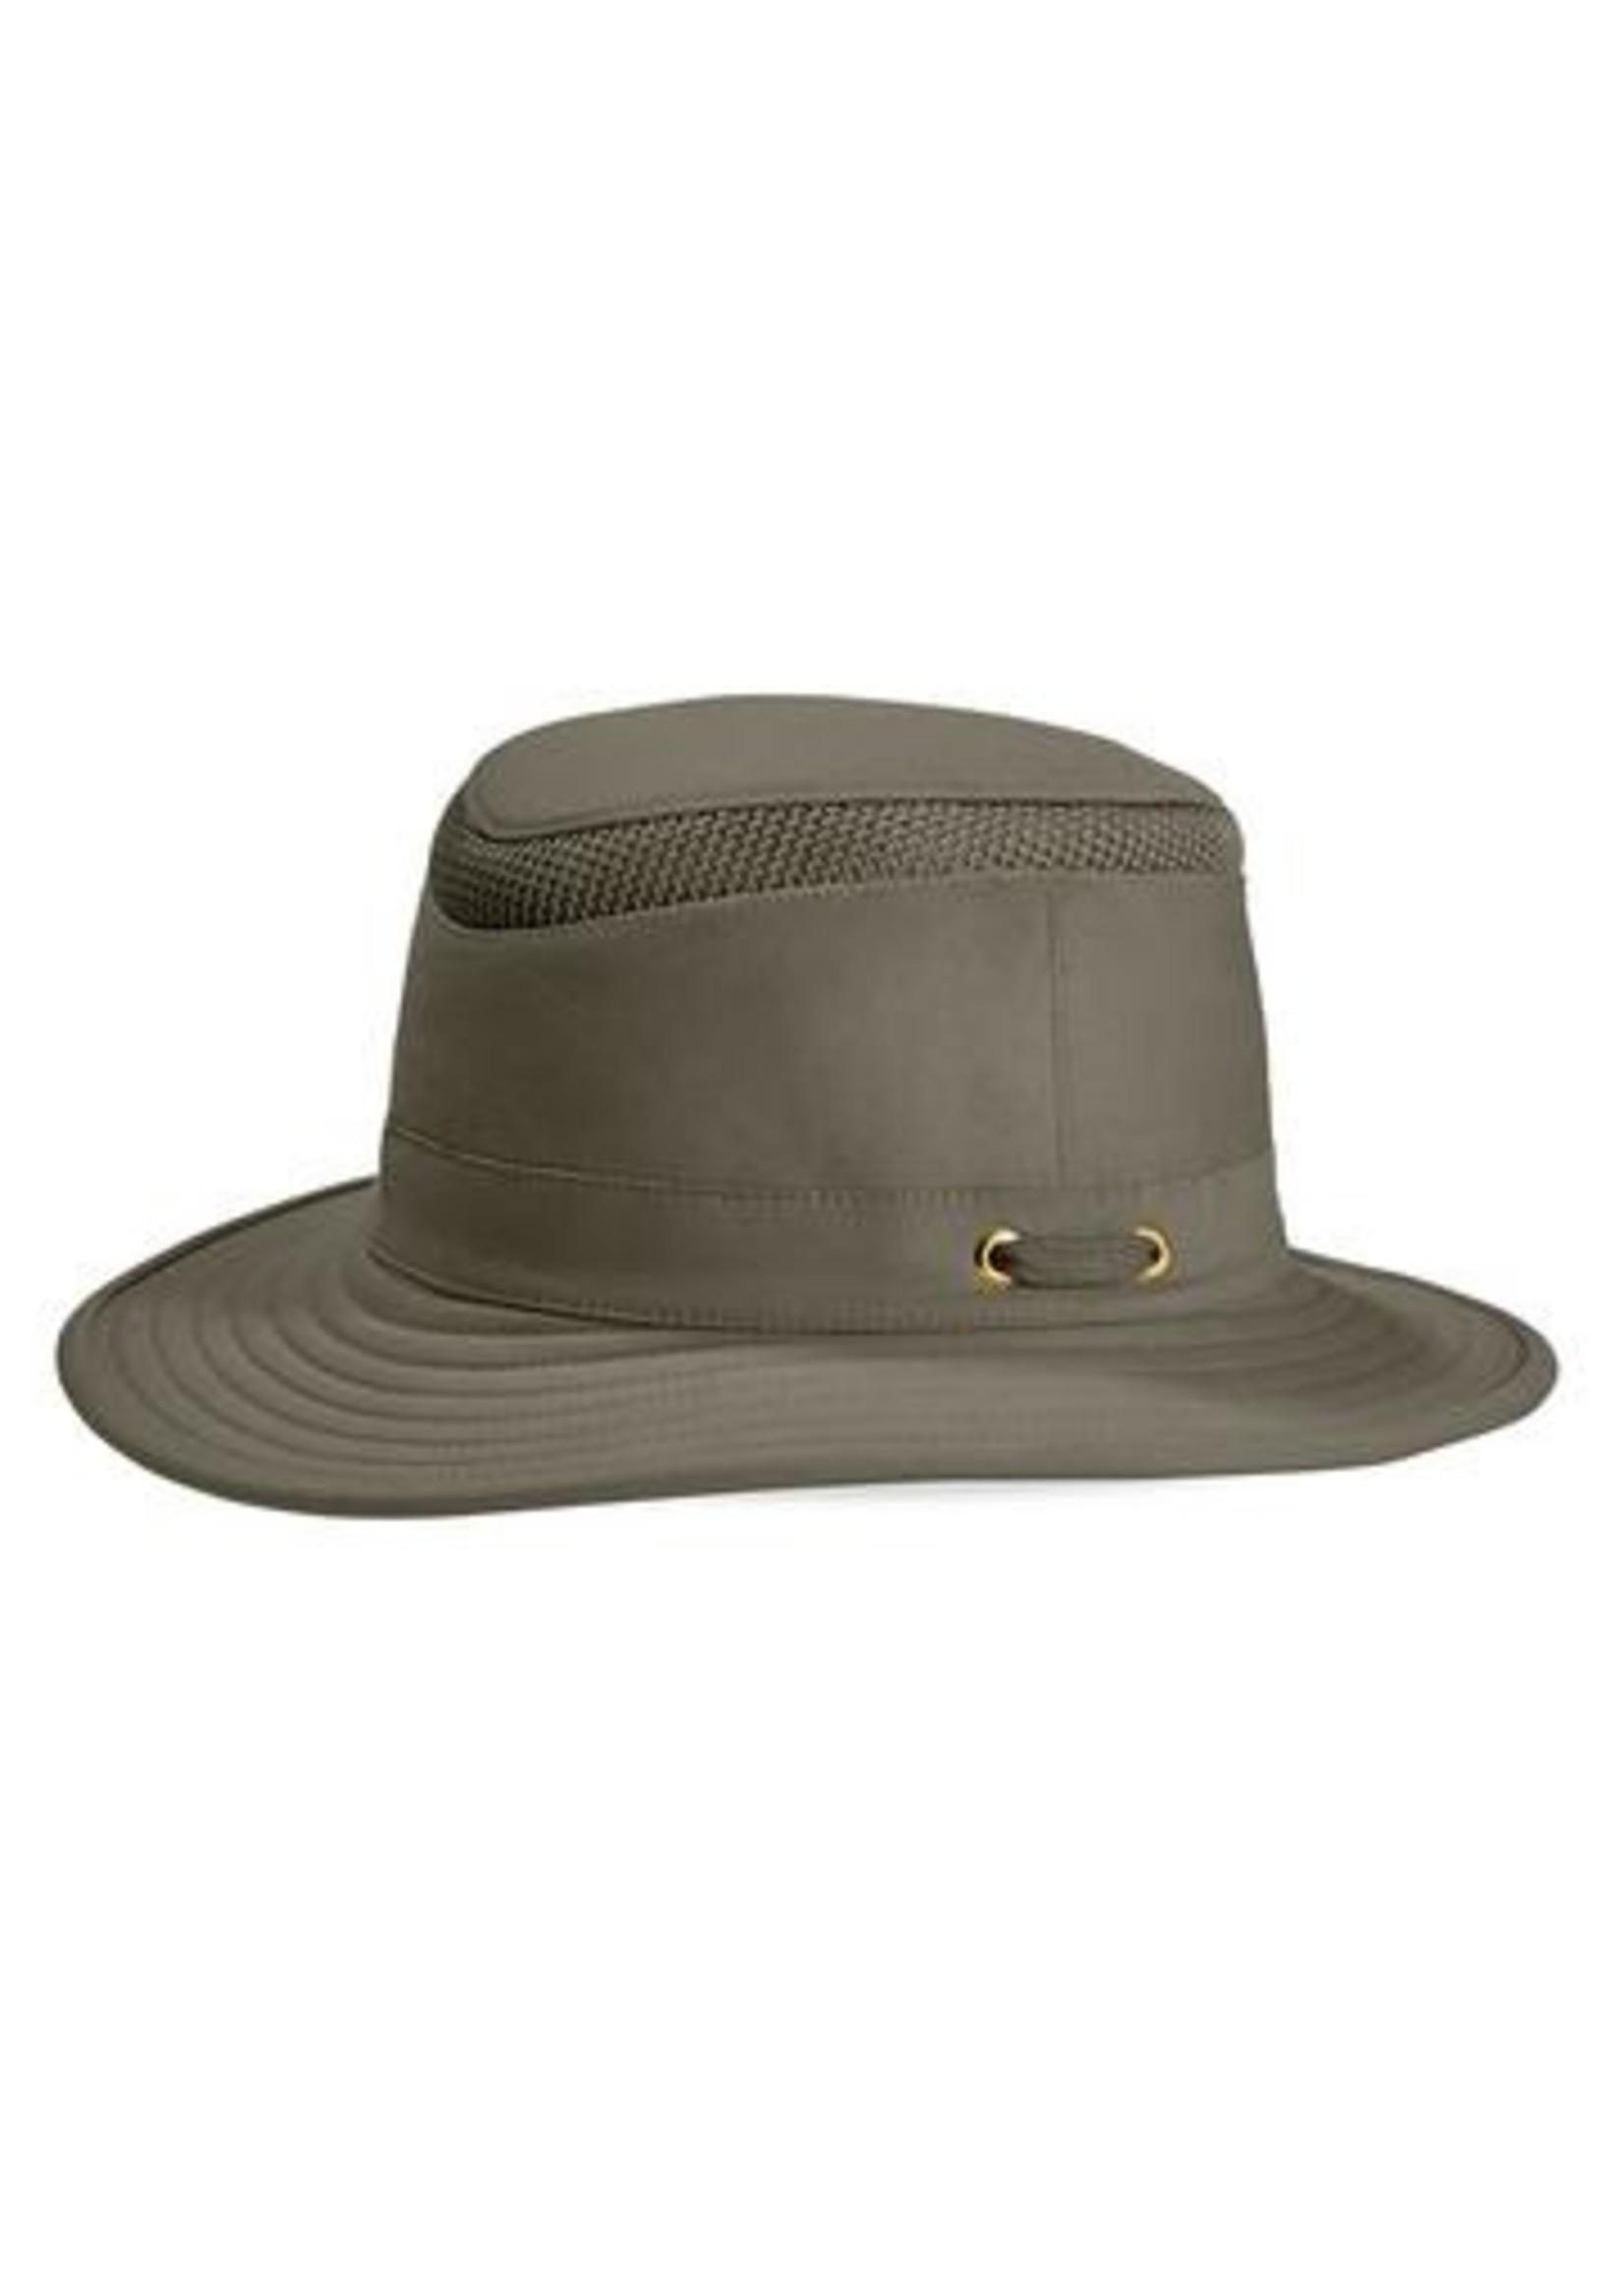 Tilley TILLEY ORGANIC AIRFLO HAT